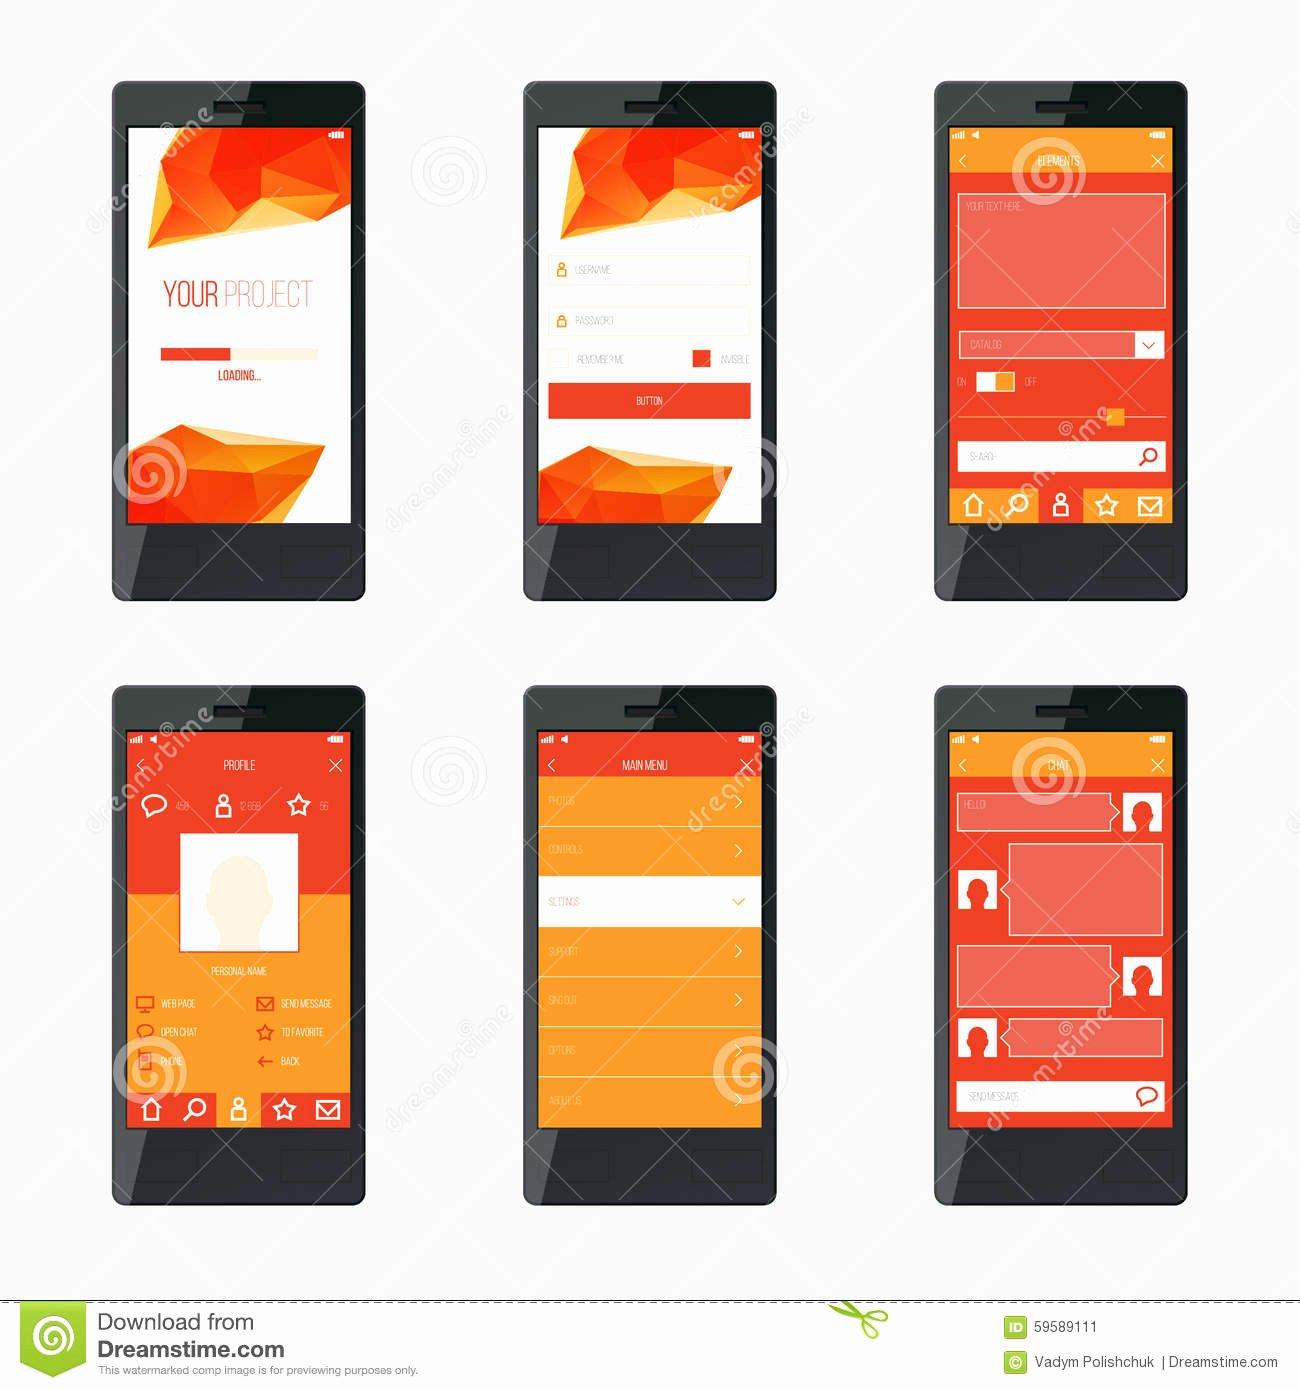 Mobile Apps Design Template Lovely Template Mobile Application Interface Design Stock Vector